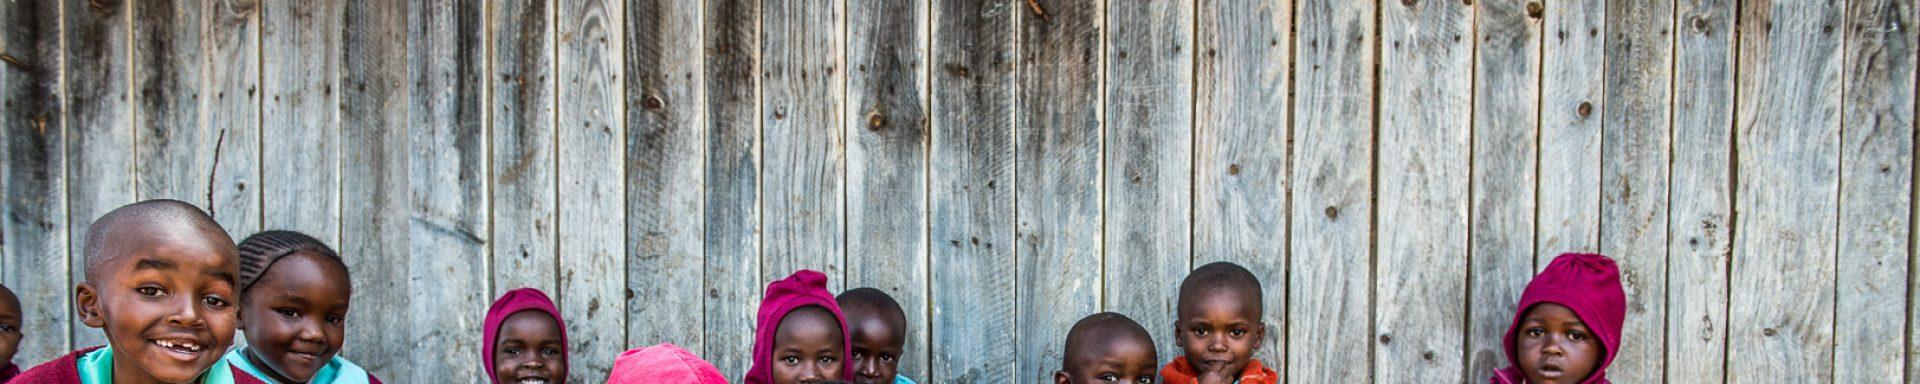 Lachende kinderen uit Kenia in rode kleding